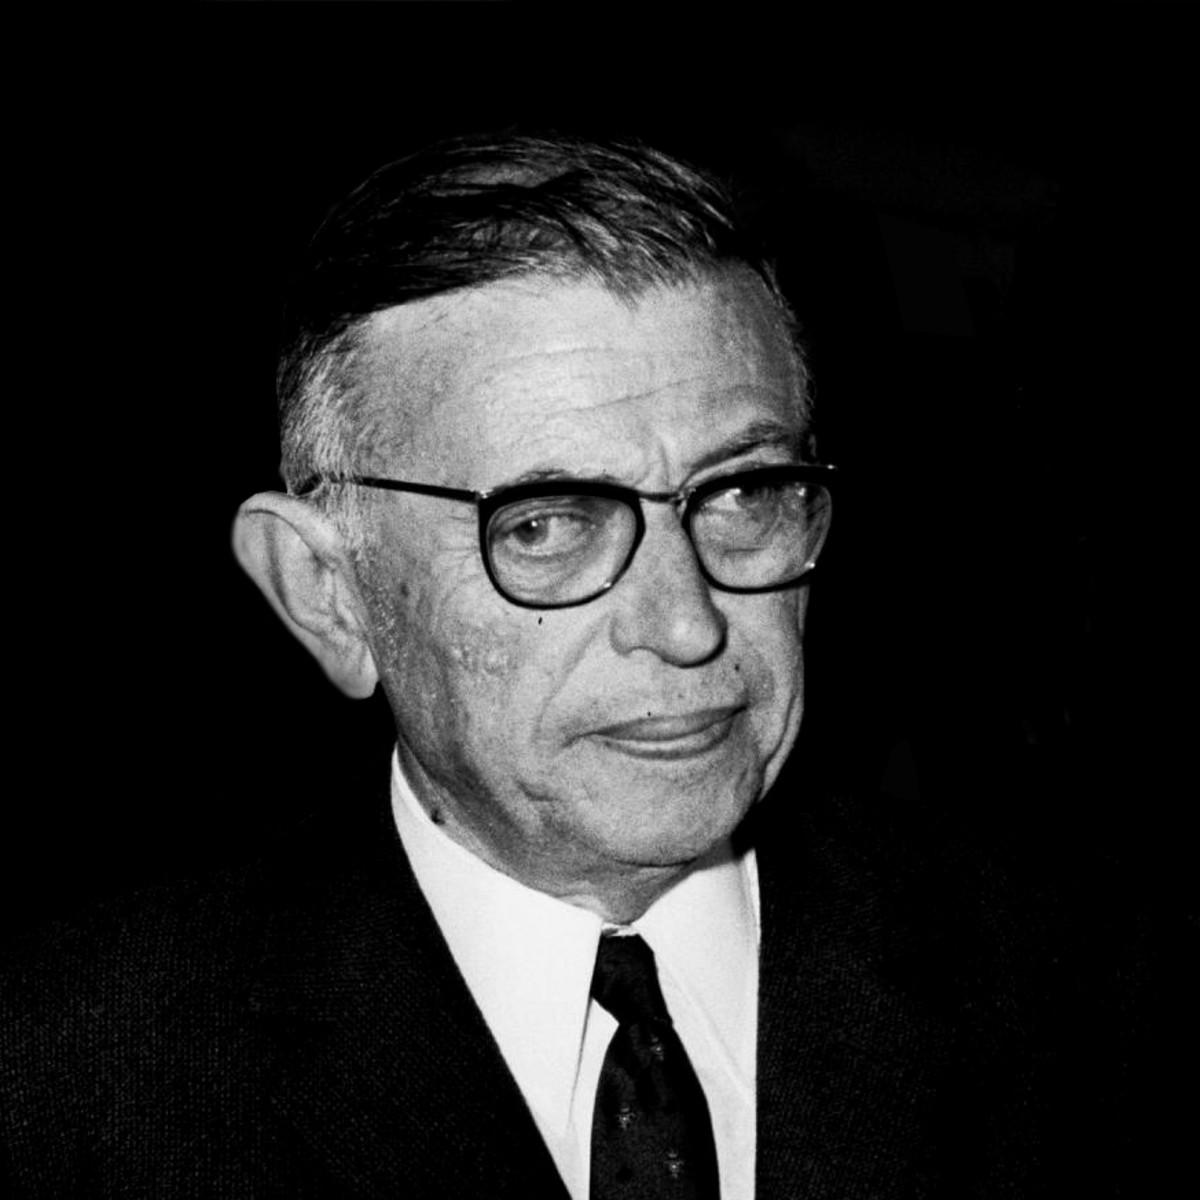 Jean-Paul Sartre  1905 - 1980